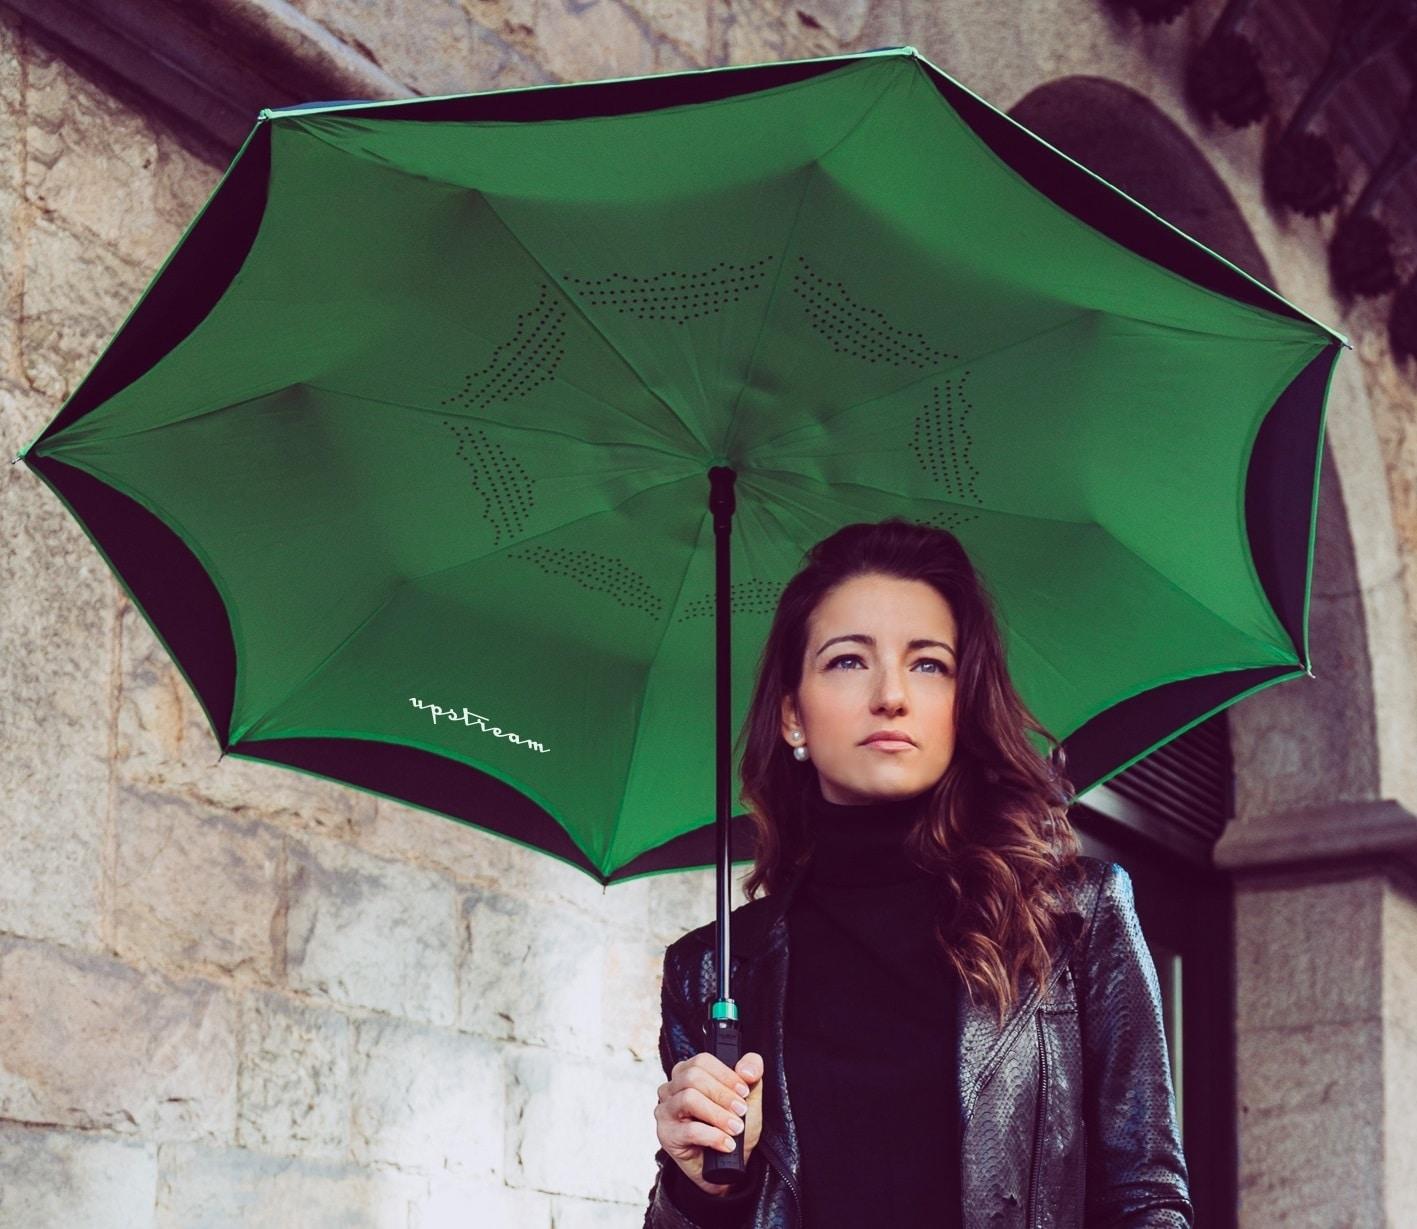 company holiday gifts umbrella